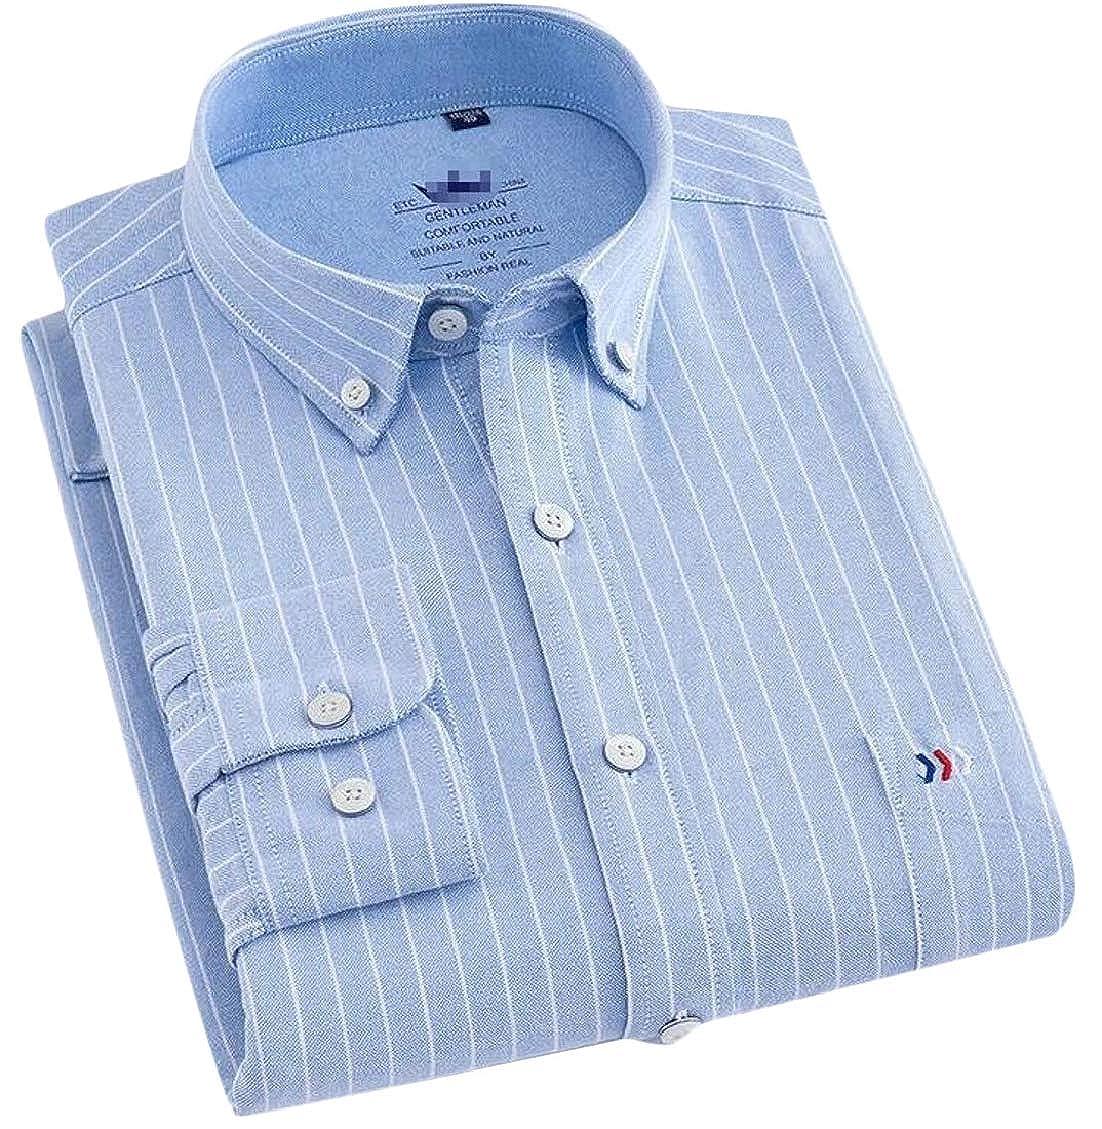 Hajotrawa Mens Regular Fit Lapel Button-Down Striped Cozy Long Sleeve Shirts